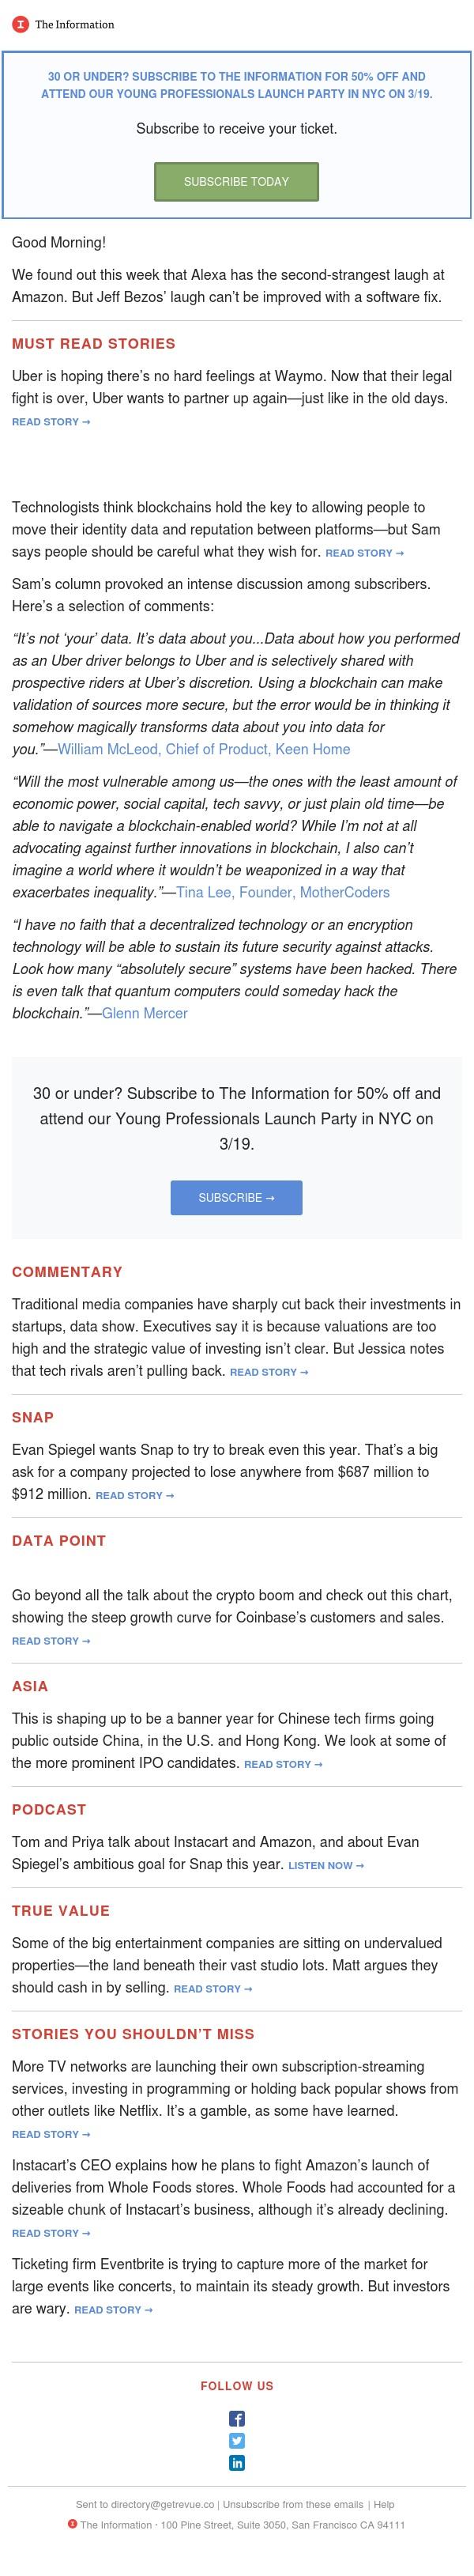 The Weekly Digest: Uber Hearts Waymo